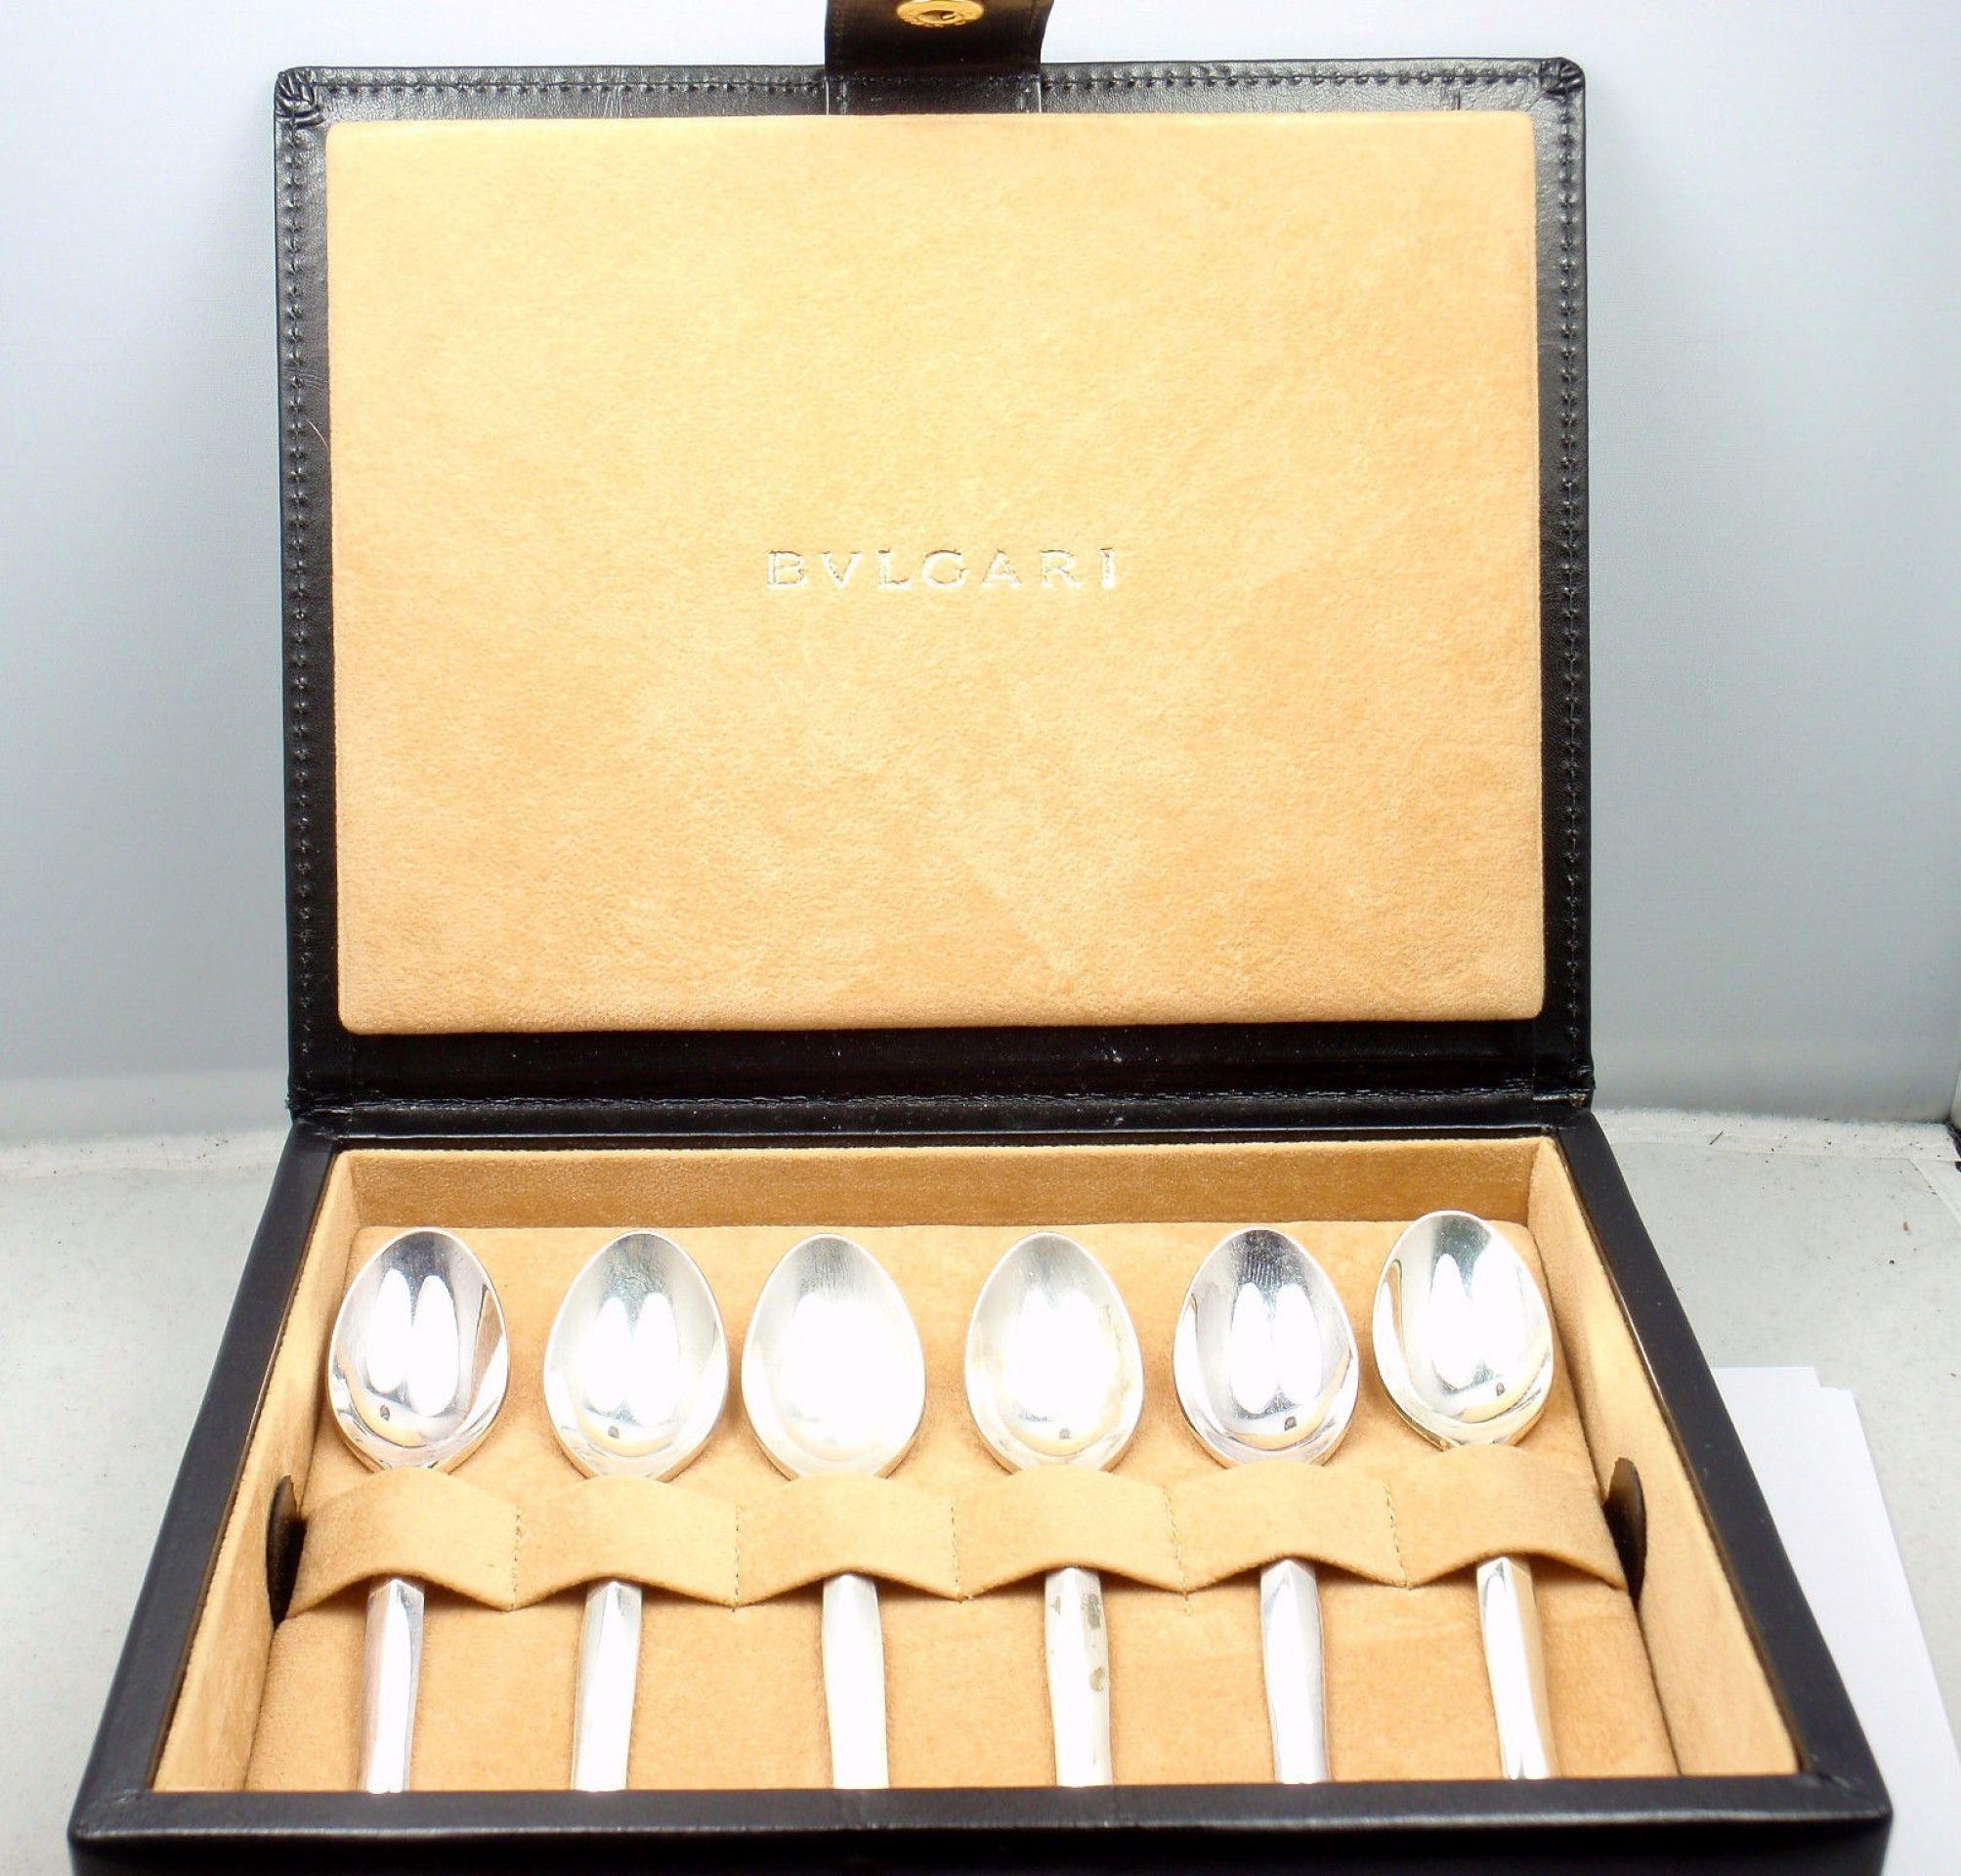 RARE Bulgari Bvlgari Sterling Silver Demi Tasse Spoon Set of 6 with Leather Case